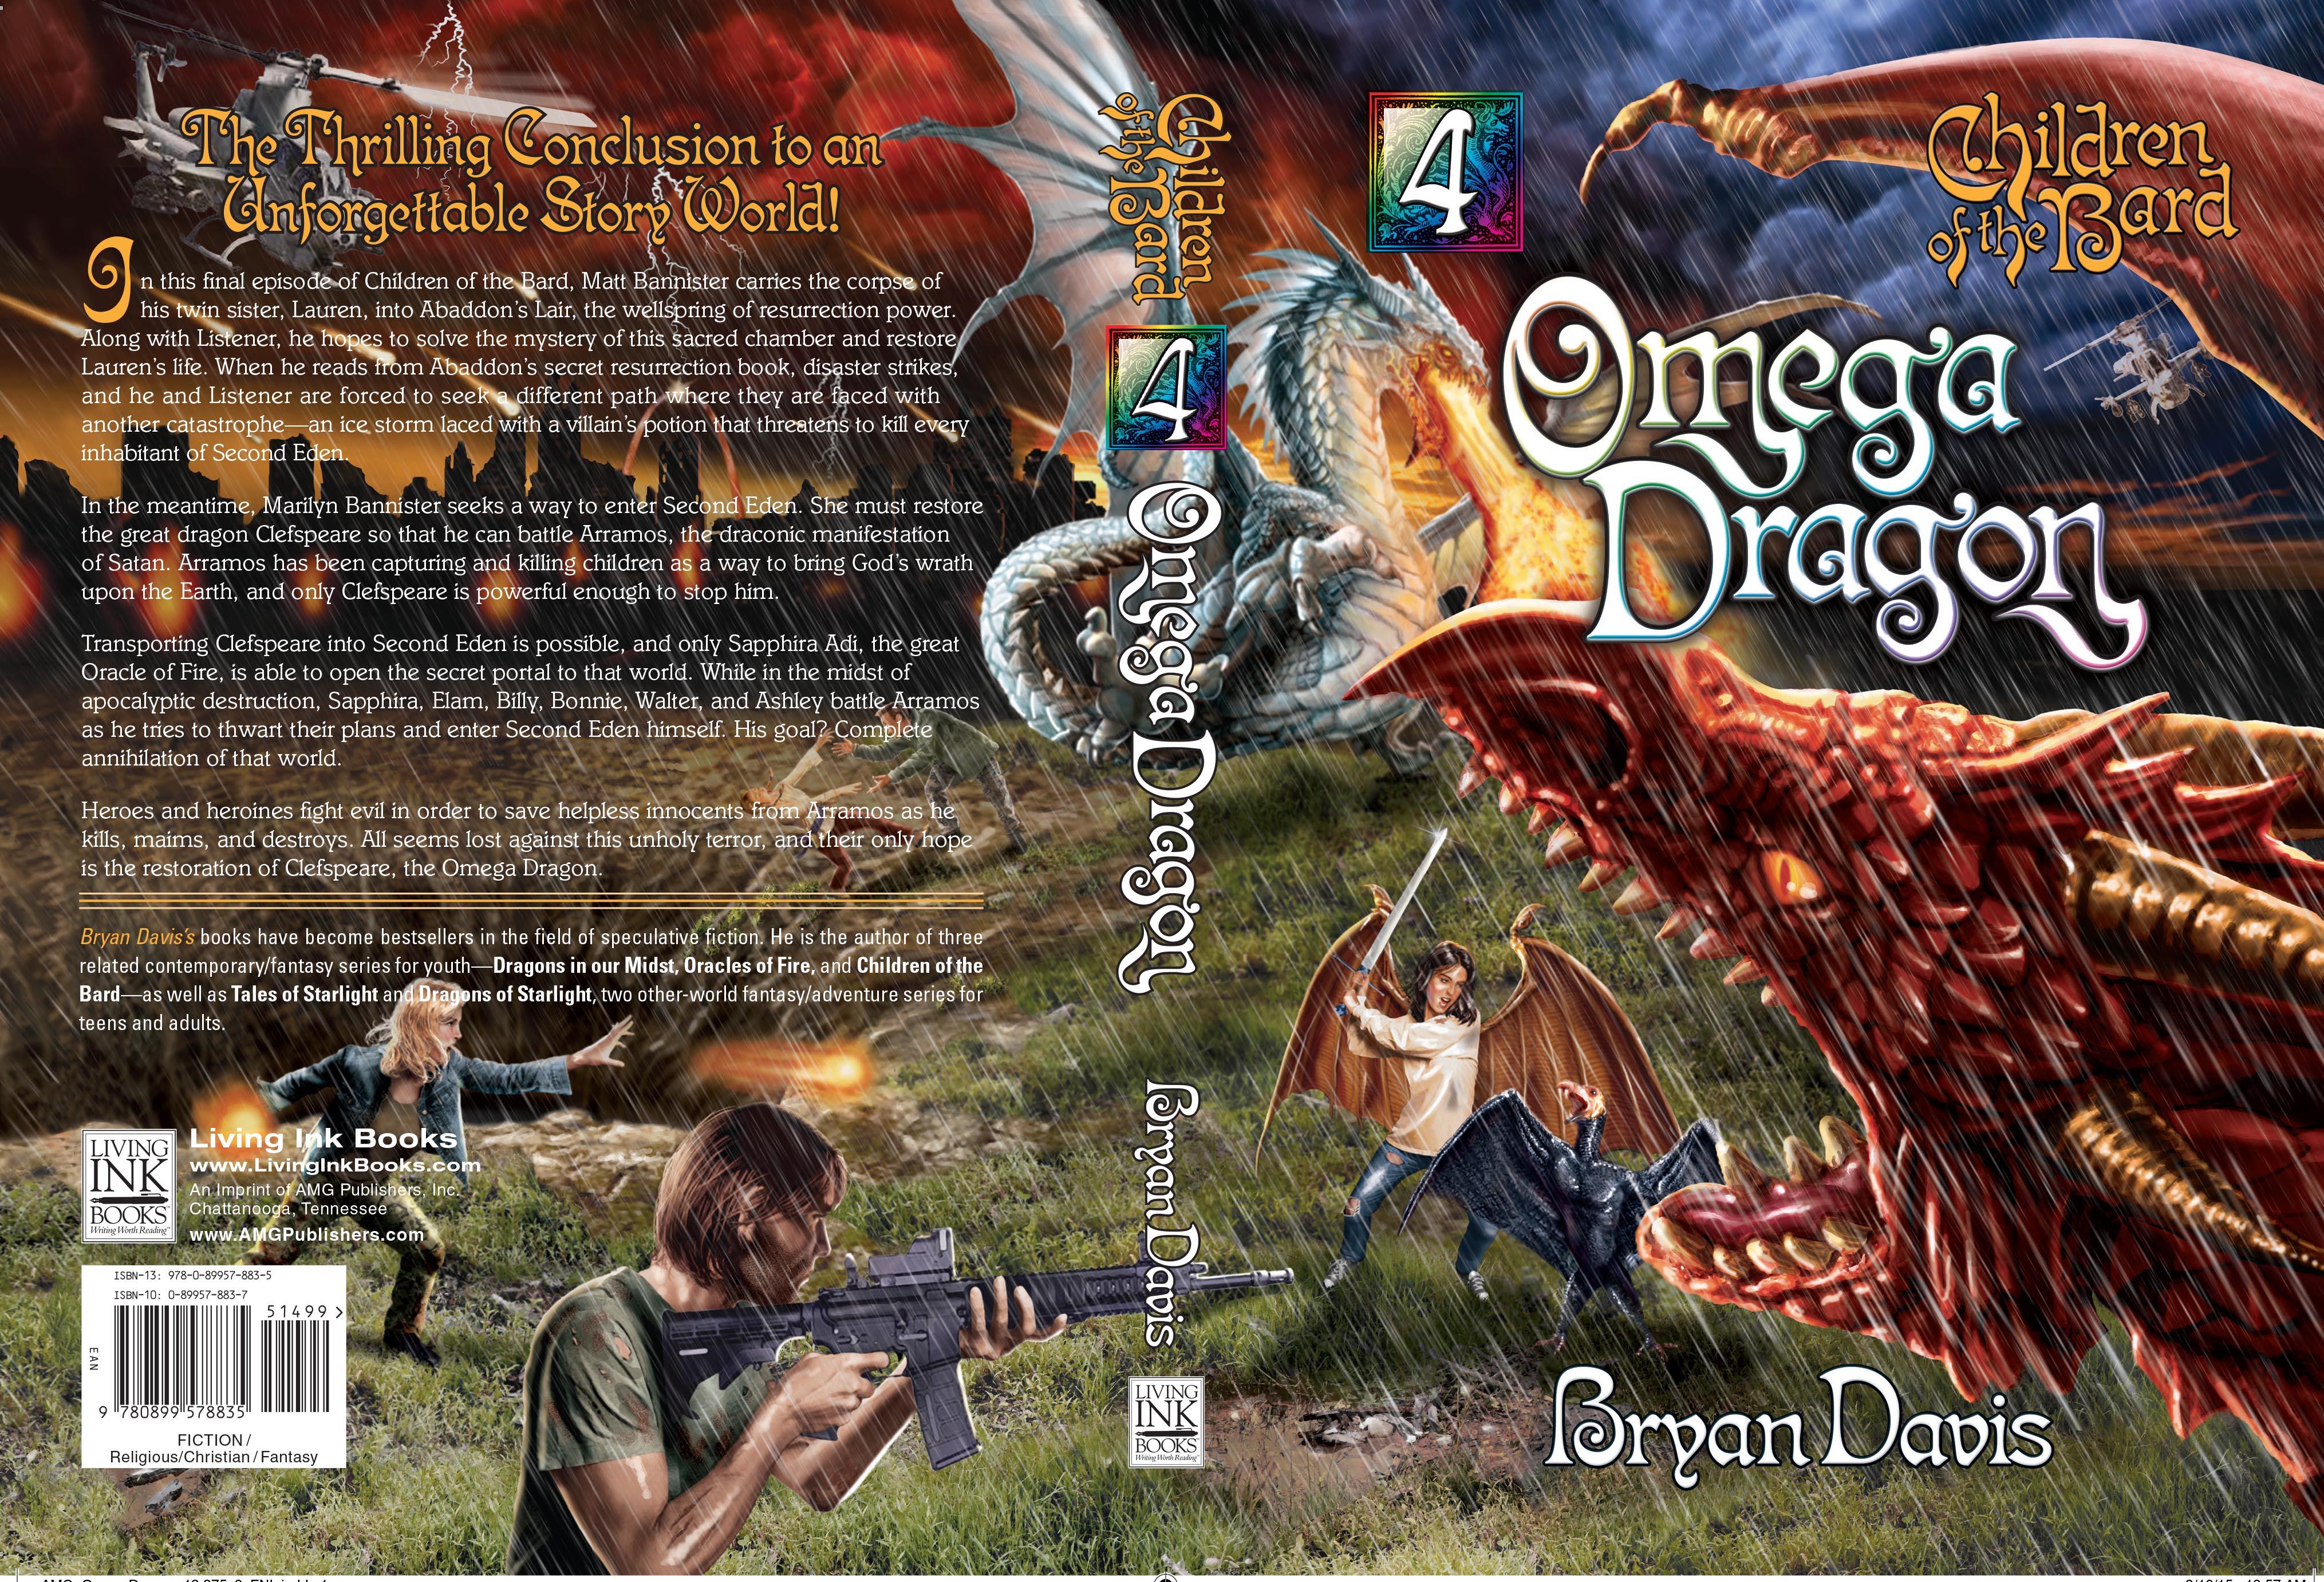 AMG_OmegaDragon_13.375x9_FNL-1